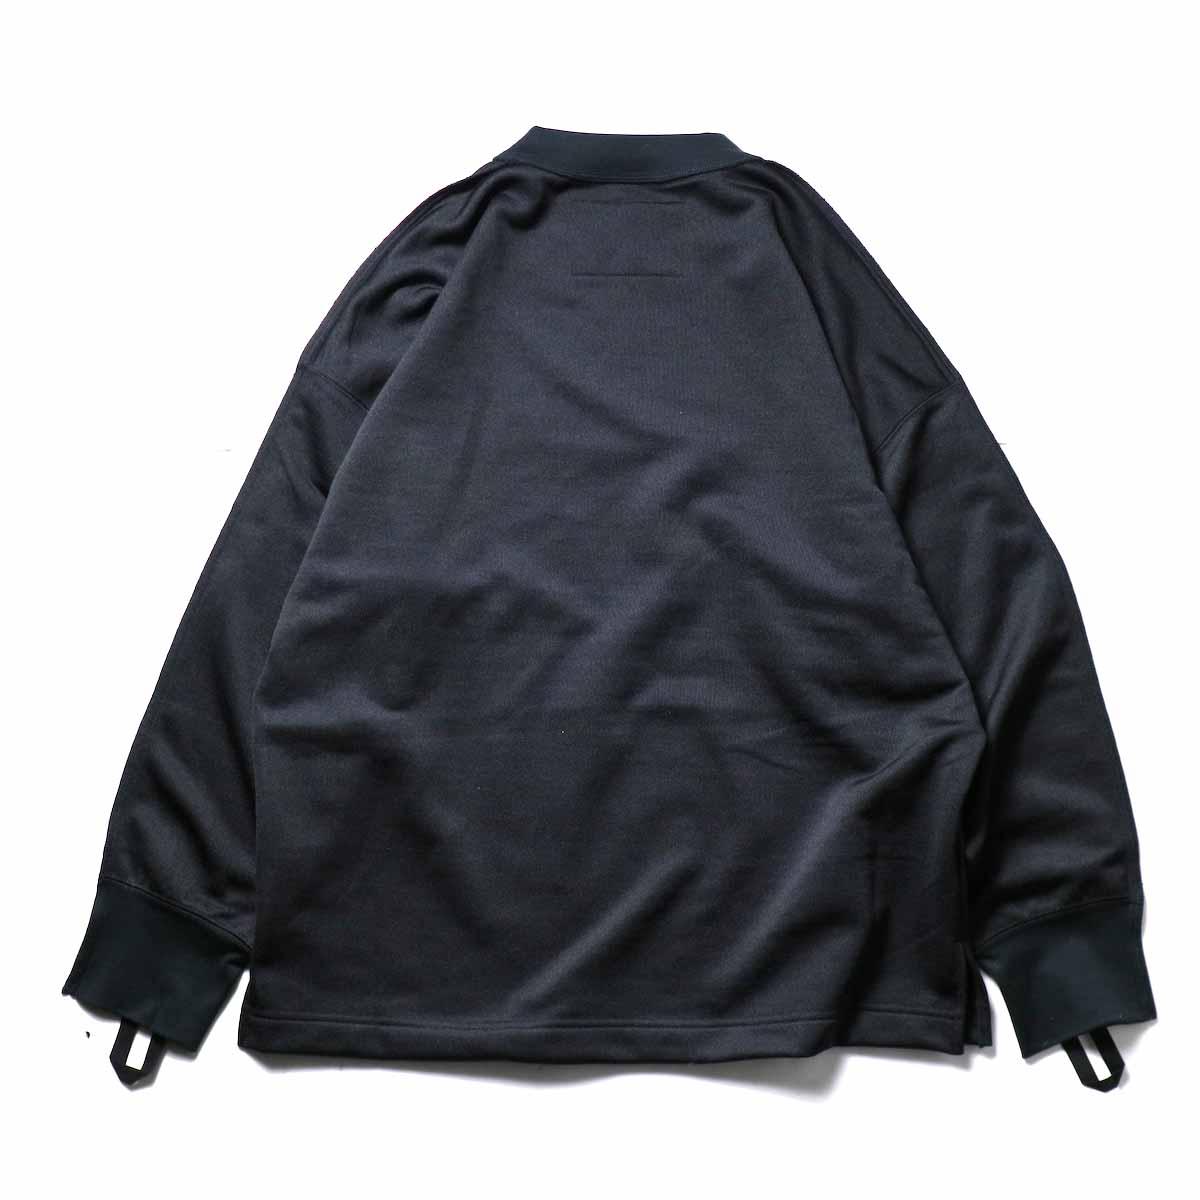 N.HOOLYWOOD / 9211-CS08-024pieces L/S Jersey (Black)背面